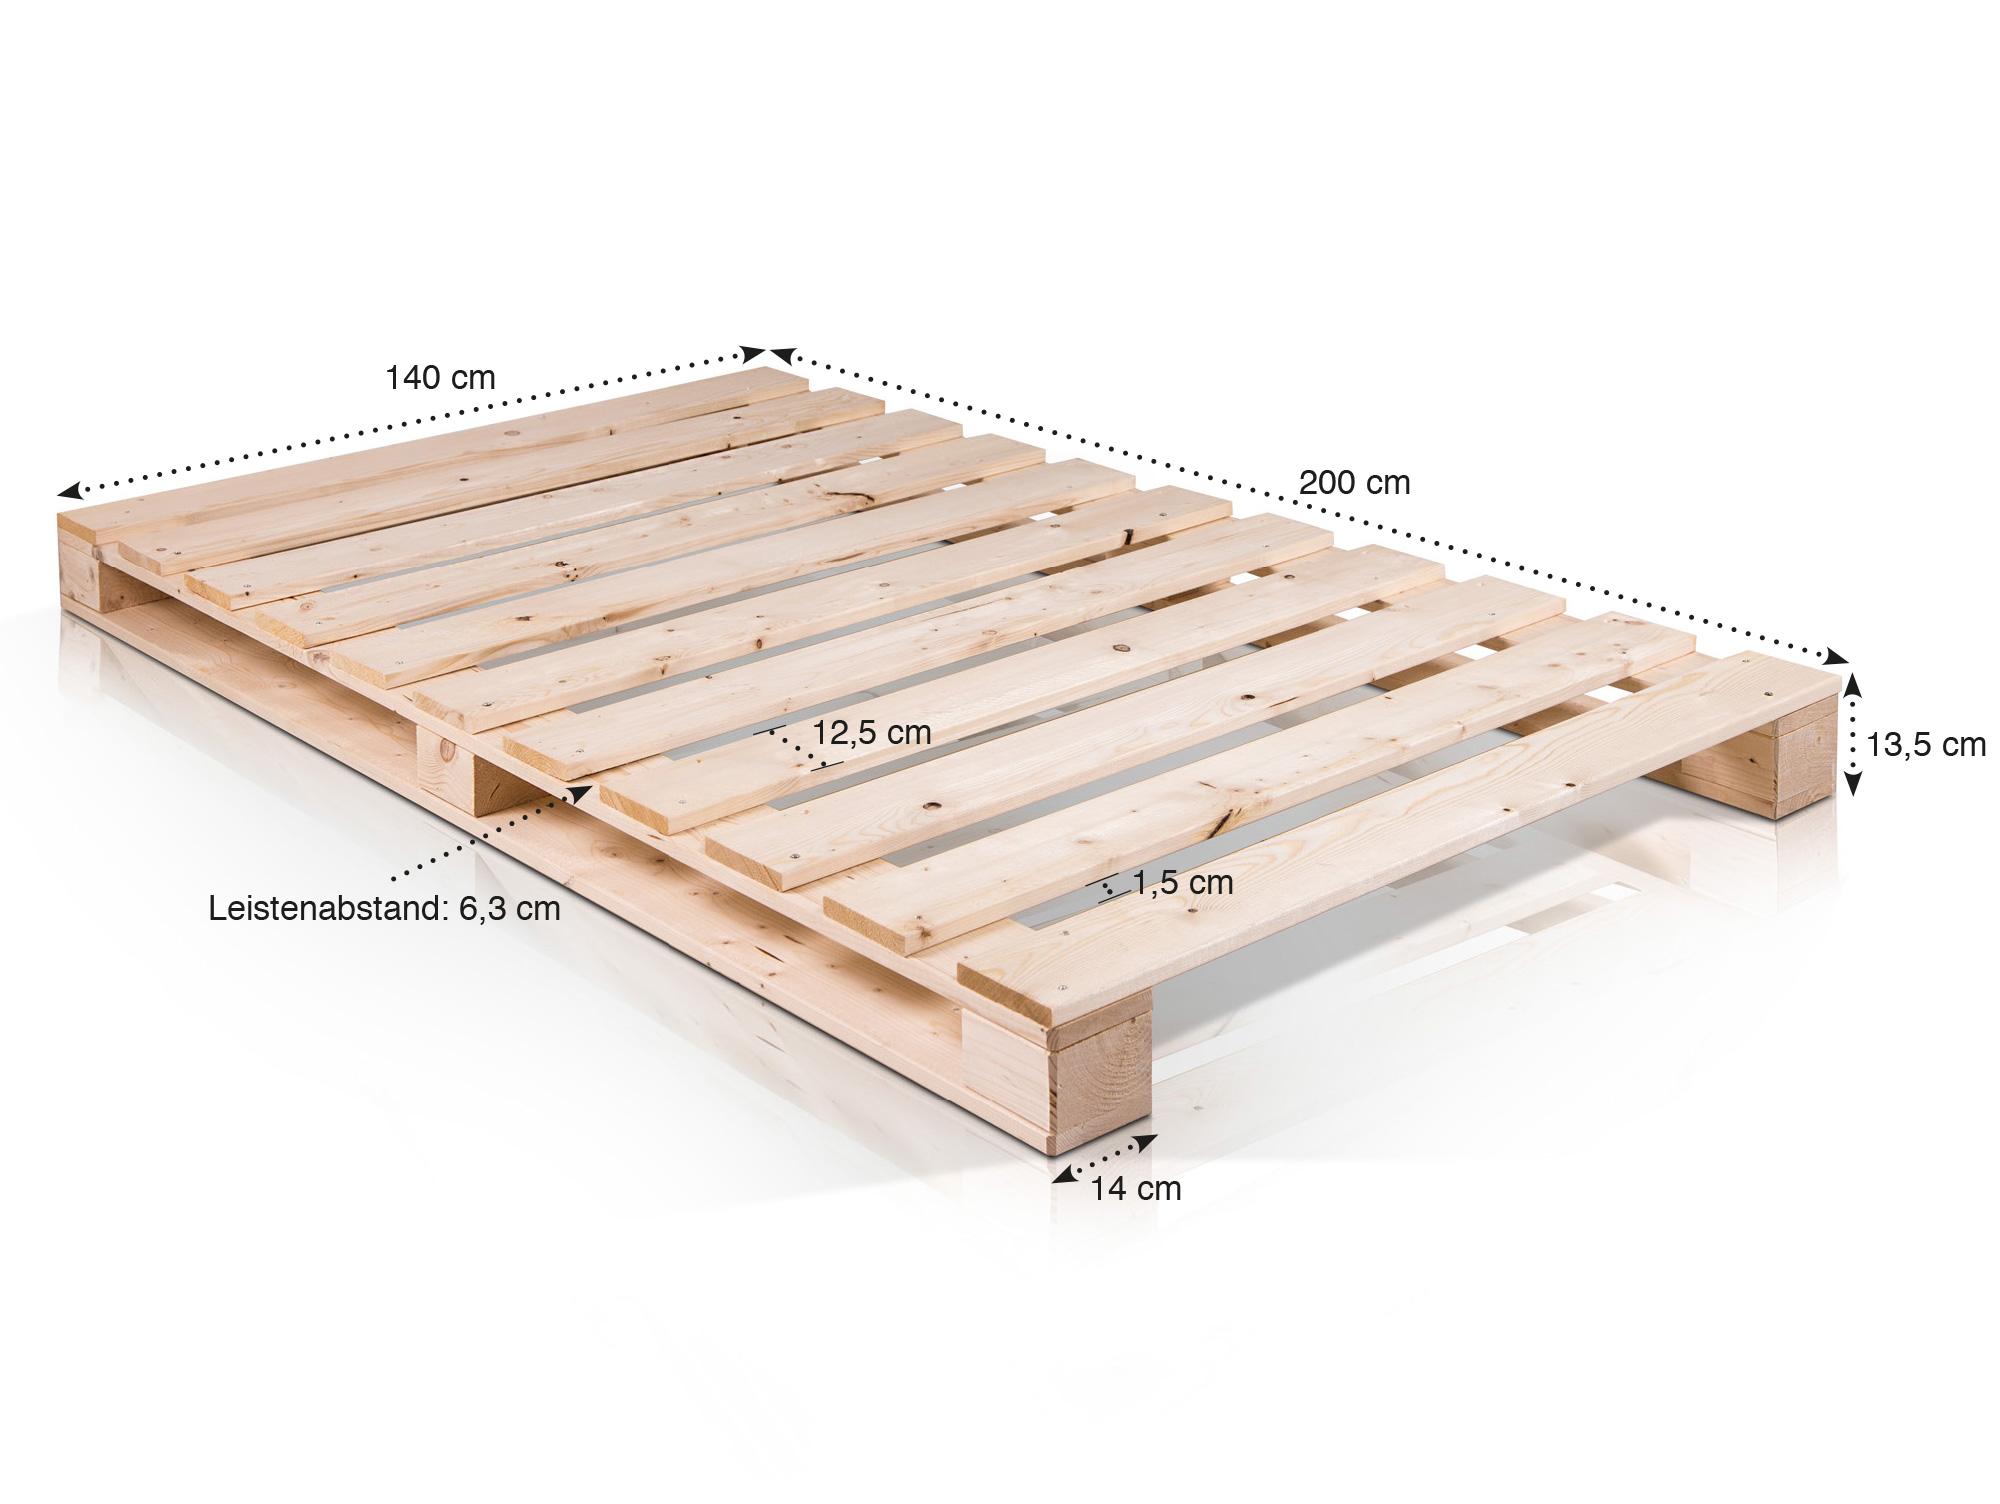 paletti massivholzbett aus paletten 140 x 200 cm fichte natur. Black Bedroom Furniture Sets. Home Design Ideas